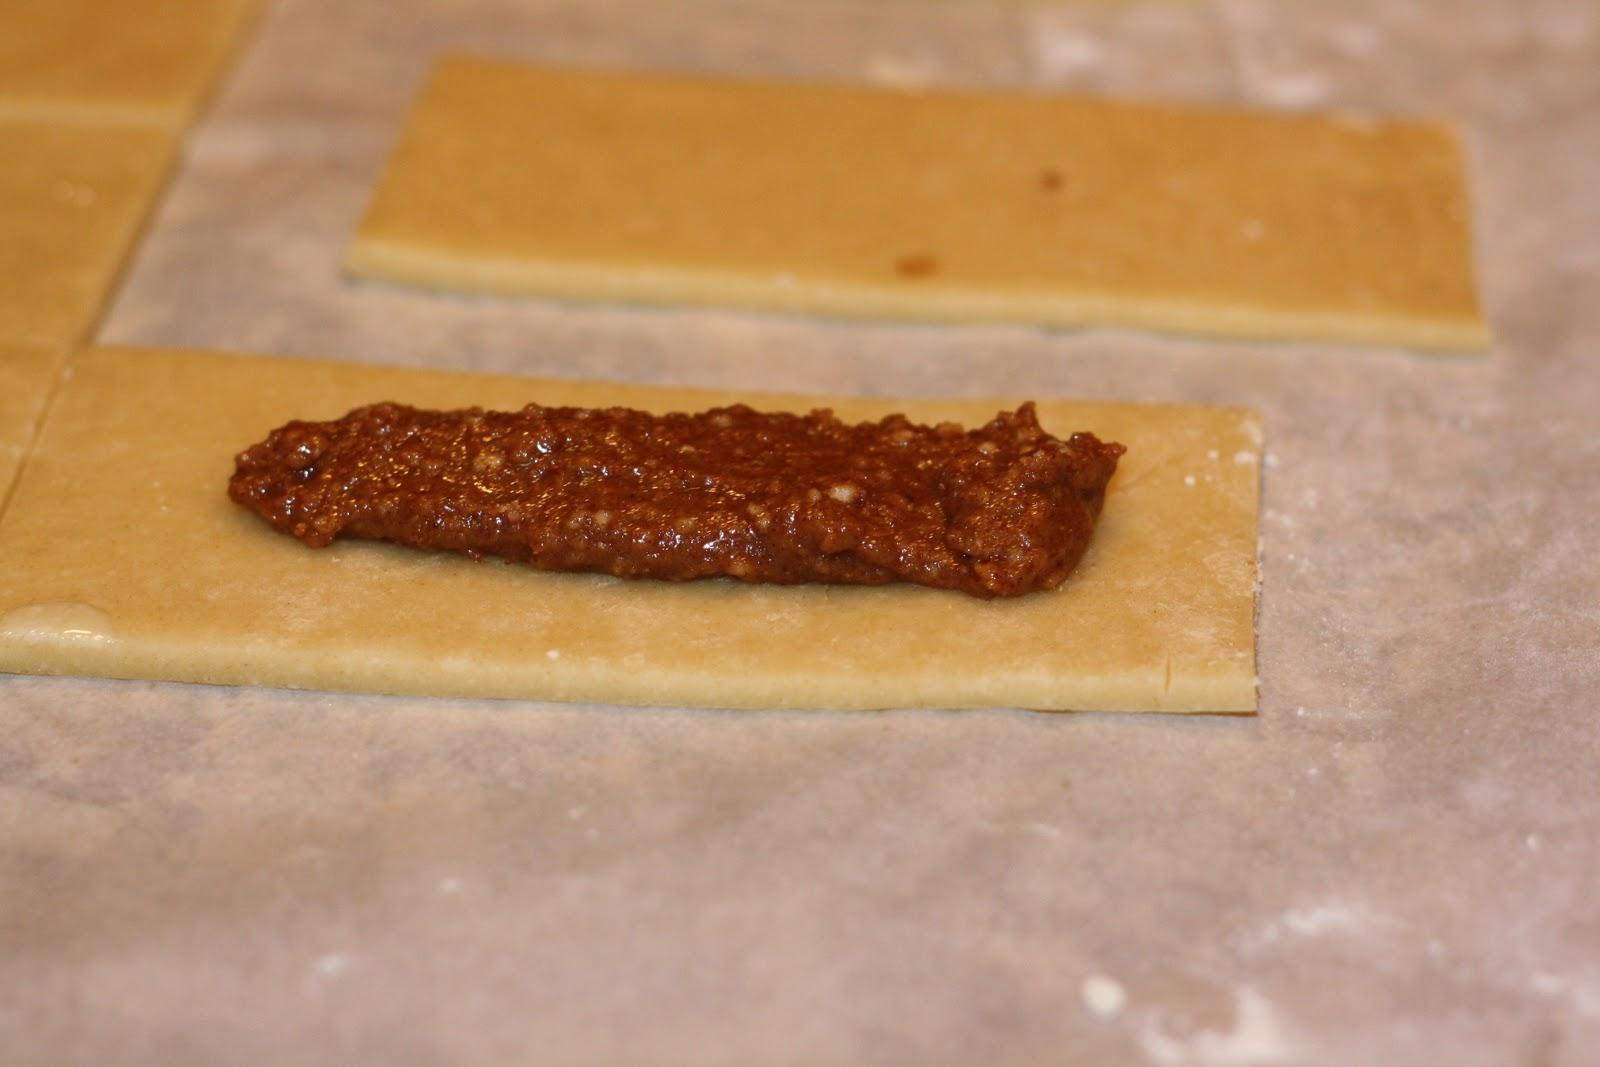 sunday sweets: cinnamon-sugar pastry pockets